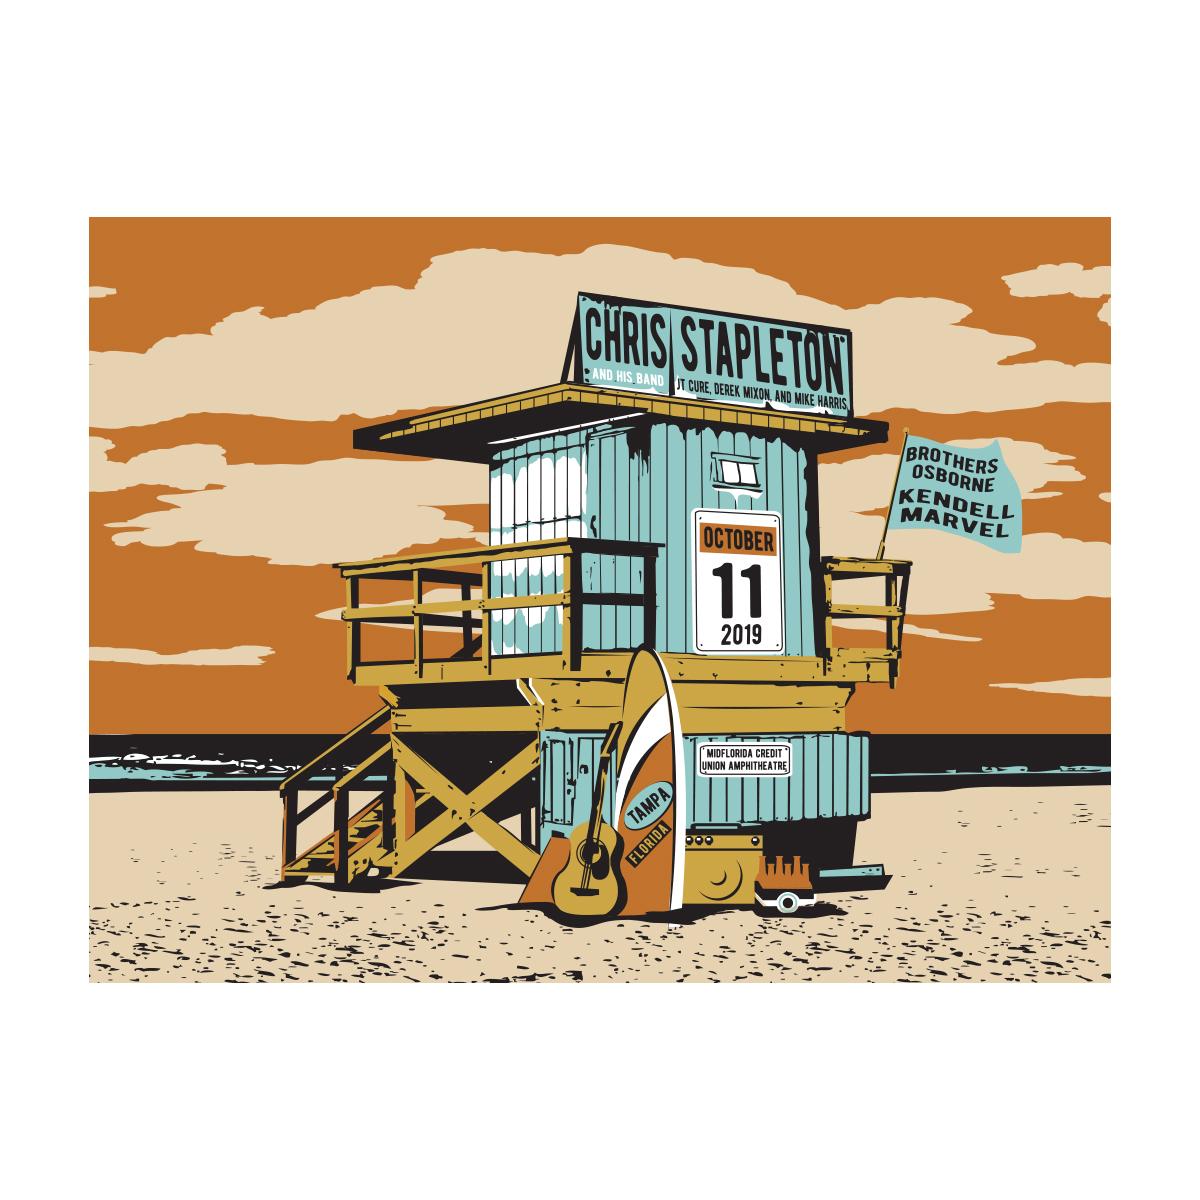 Chris Stapleton Show Poster – Tampa, FL 10/11/19